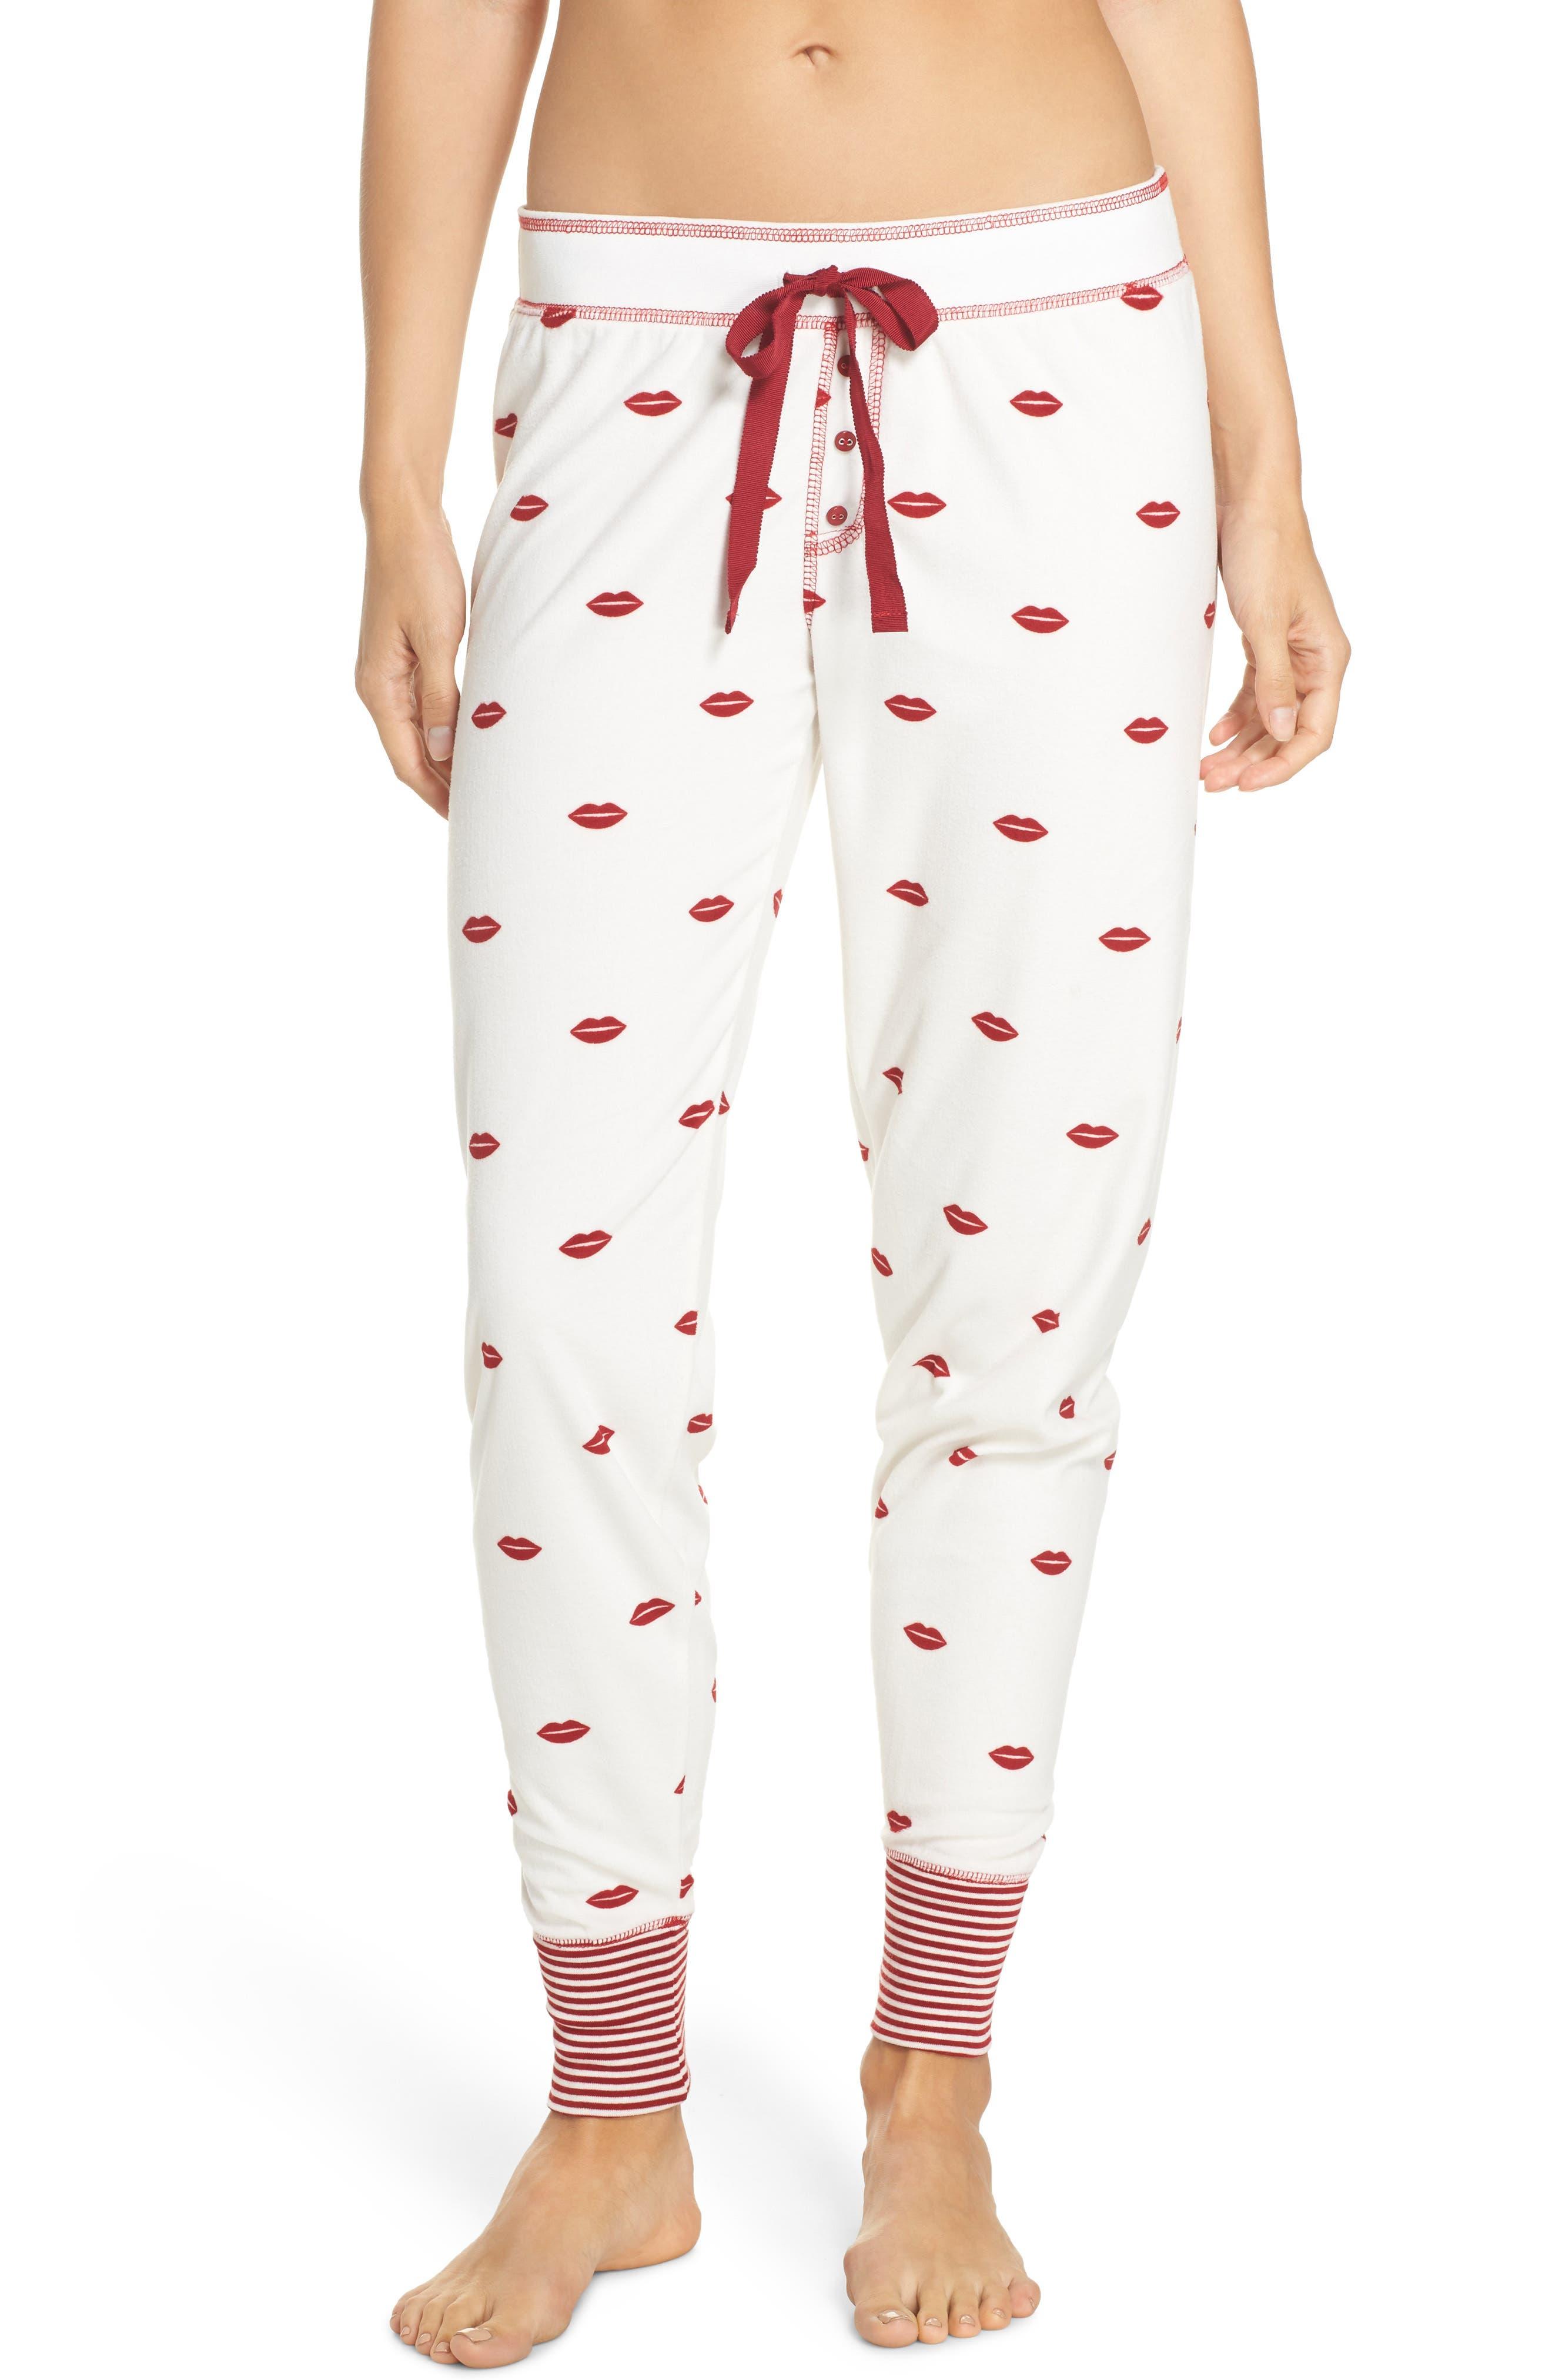 PJ SALVAGE Lip Print Pajama Pants, Main, color, 900